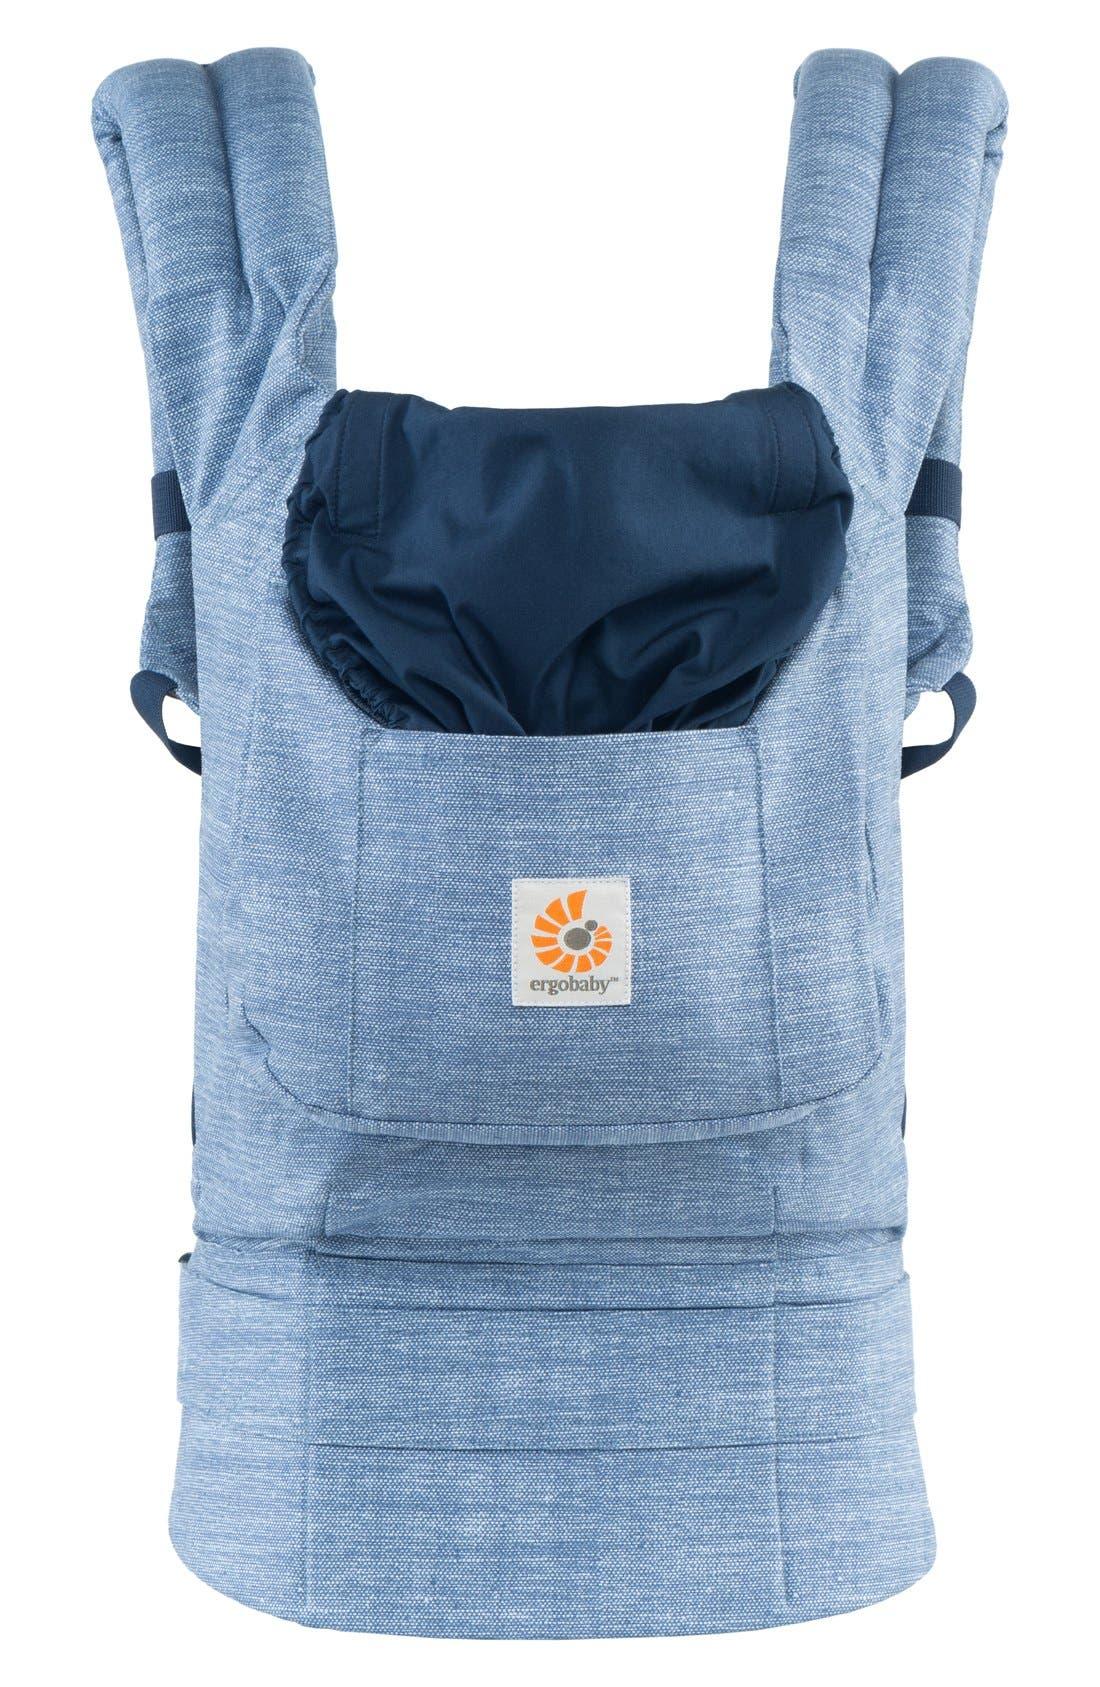 Main Image - ERGObaby 'Original' Cotton Baby Carrier